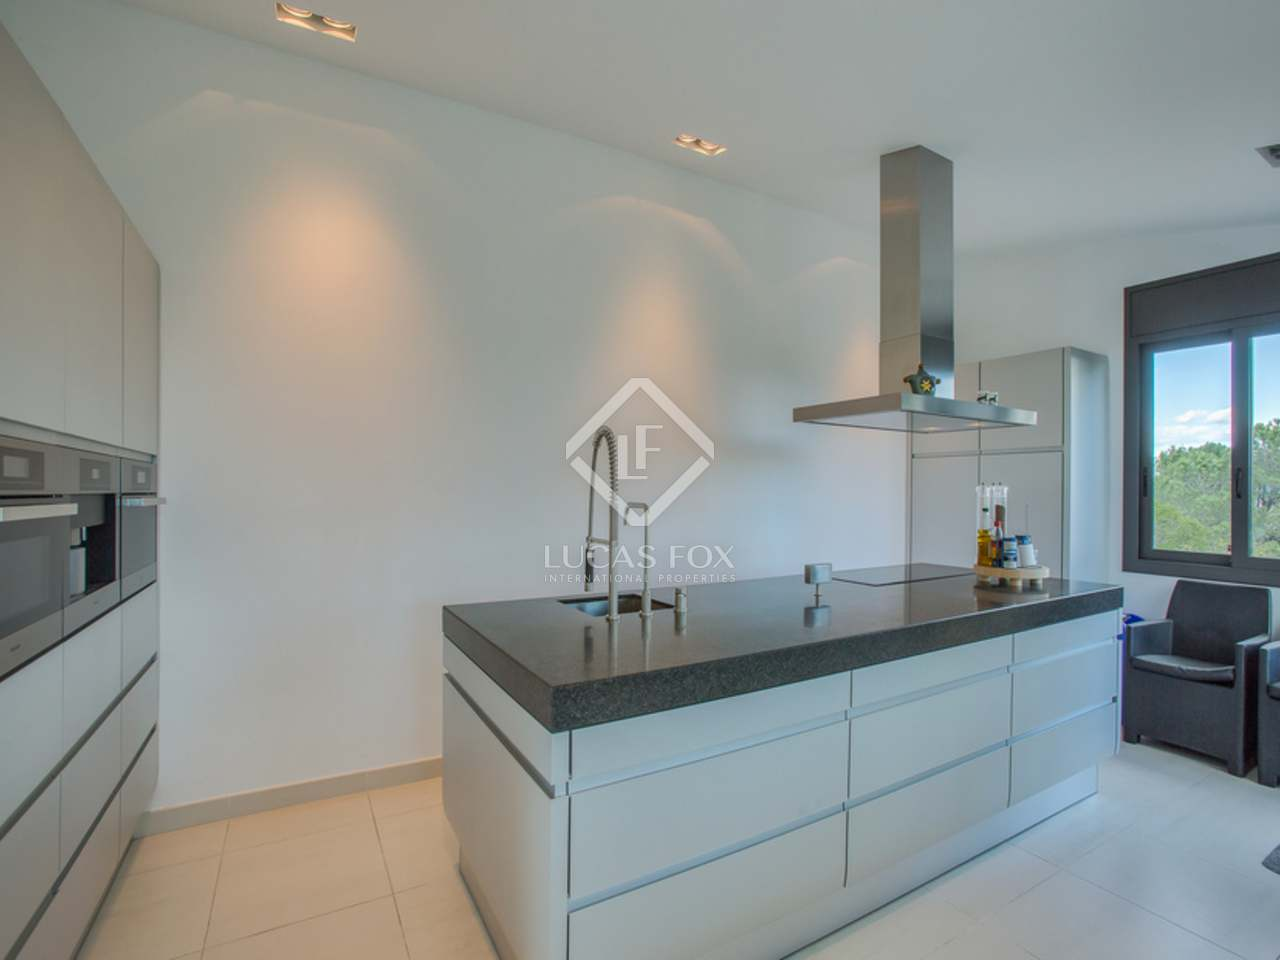 372m golf immobilie zum verkauf in sant feliu de gu xols punta brava. Black Bedroom Furniture Sets. Home Design Ideas